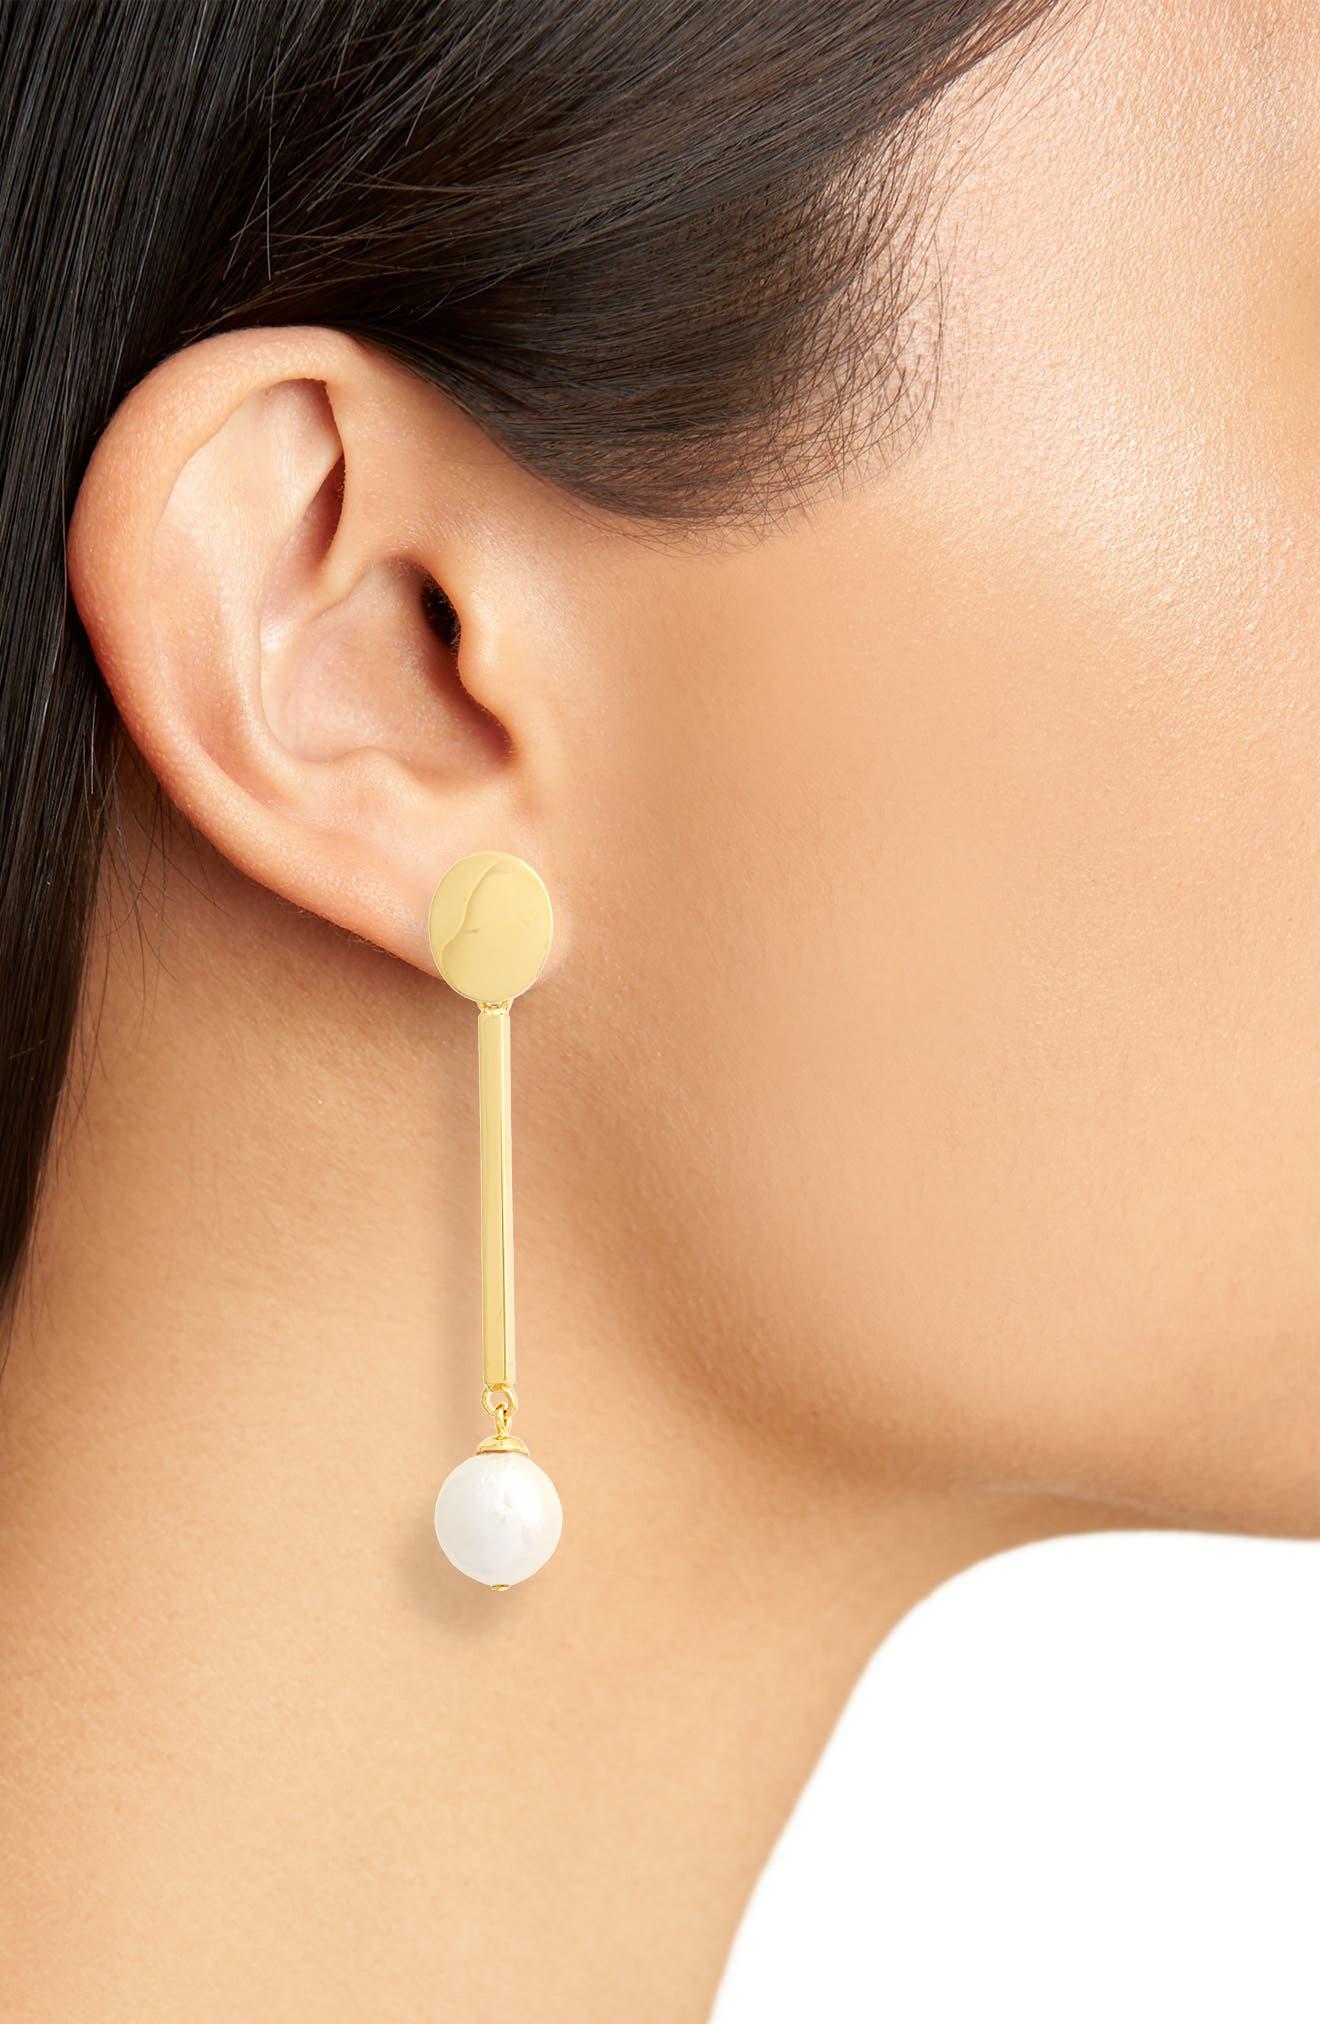 Moonbeam Pearl Earrings,                             Alternate thumbnail 2, color,                             710